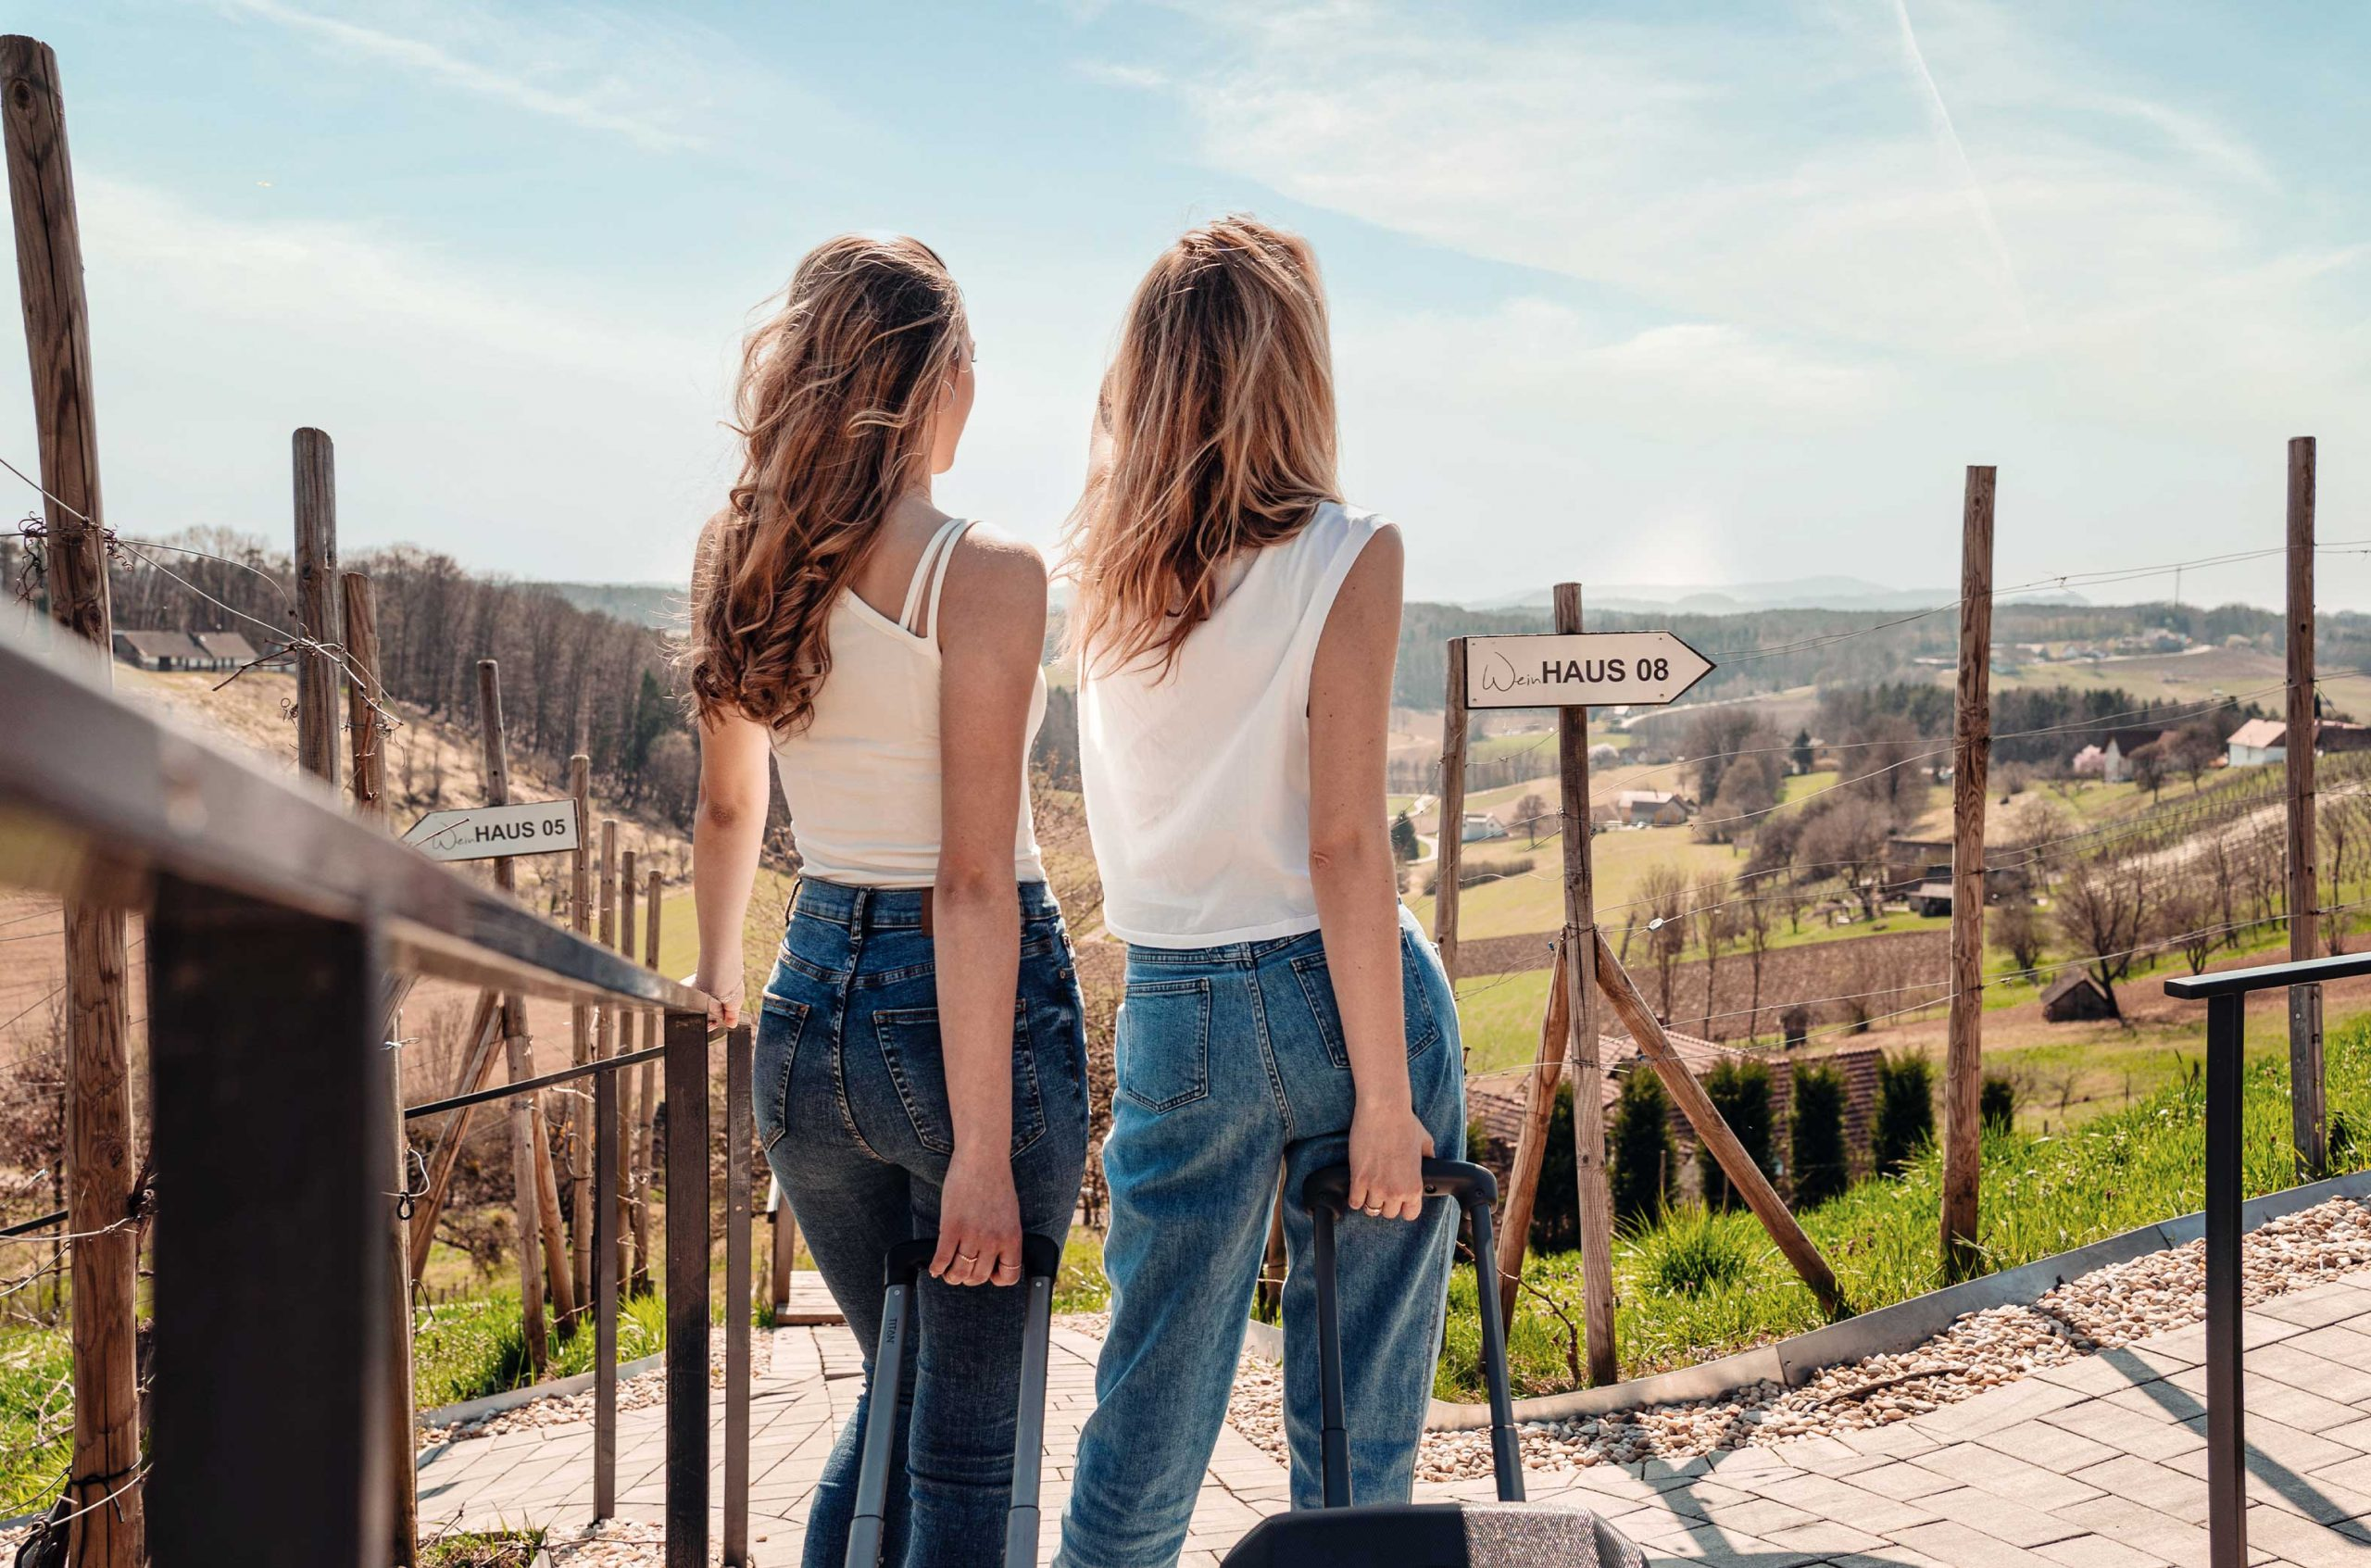 Freundinnen Shooting Tourismus Werbefotografie